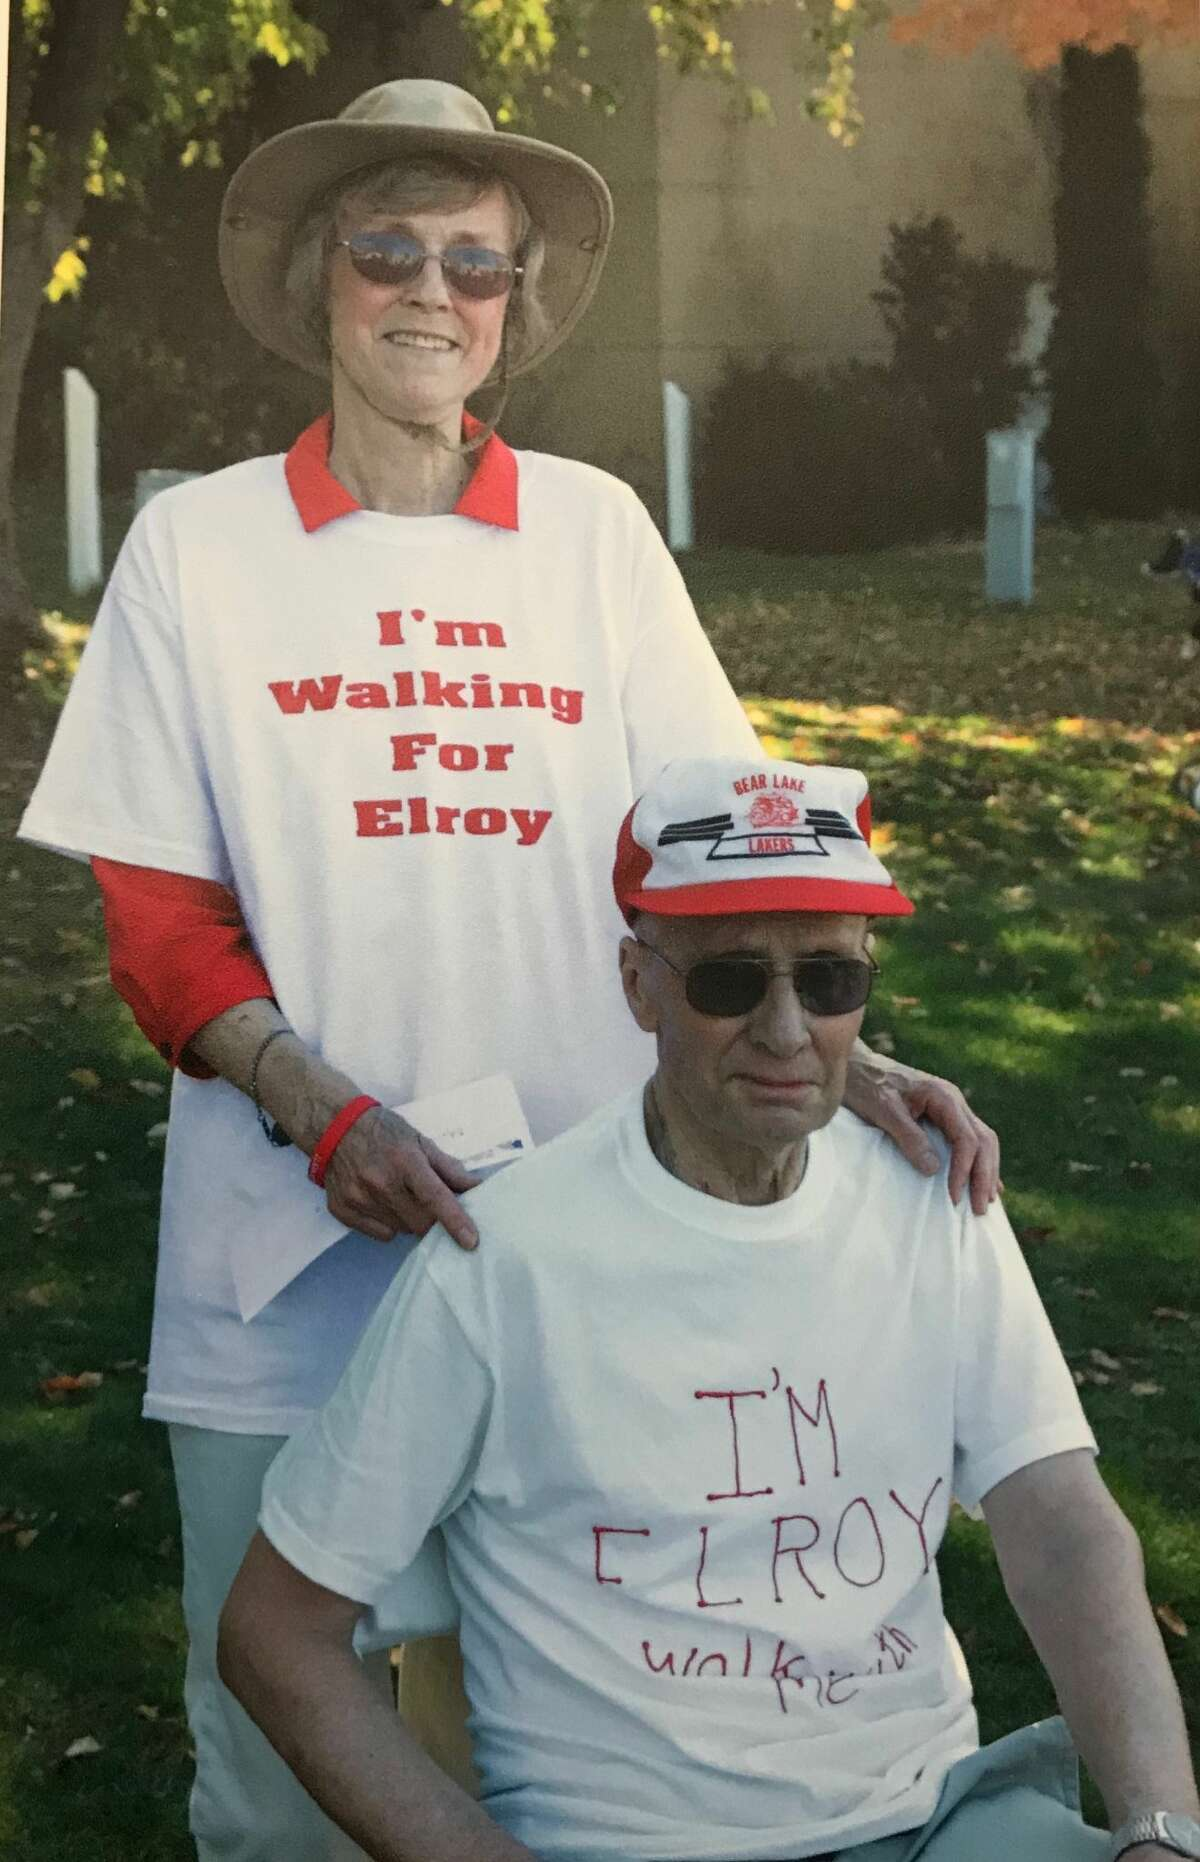 Carol Widgren Urbanus and her husband Elroy both worked for Bear Lake Schools.